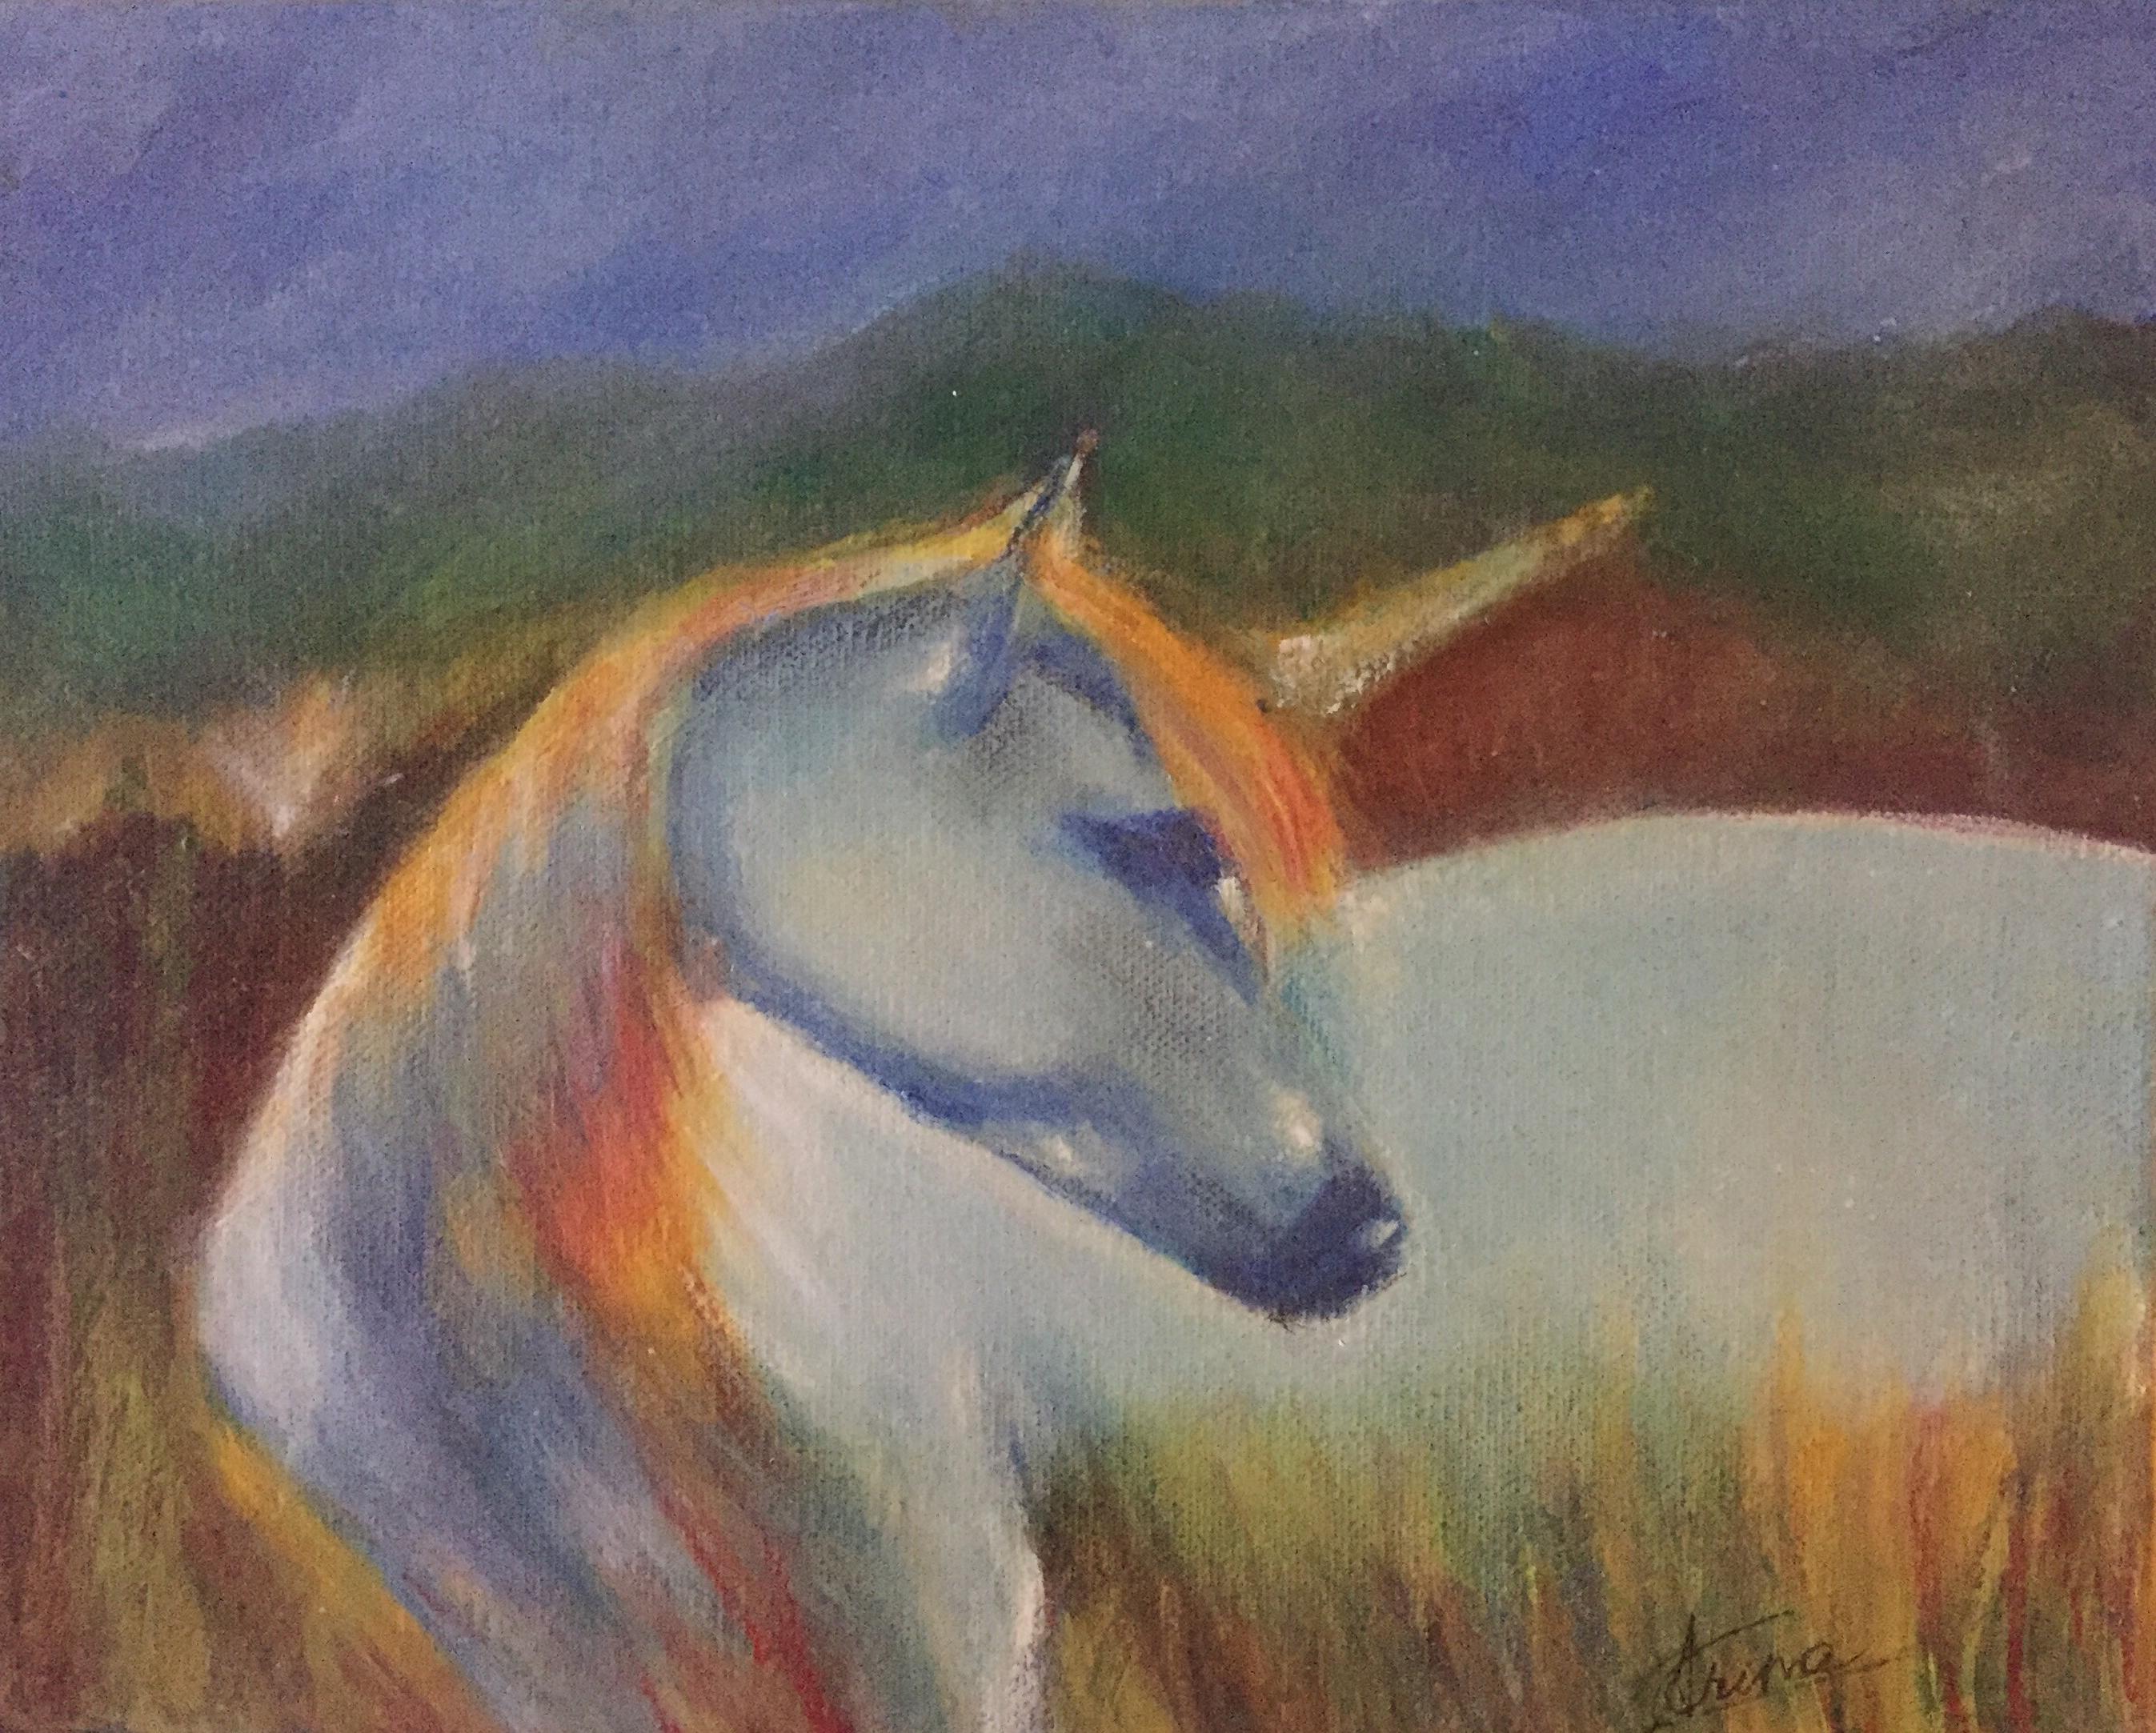 My Unicorn by Artist Aruna Chagarlamudi (Aruna's Art Studio)